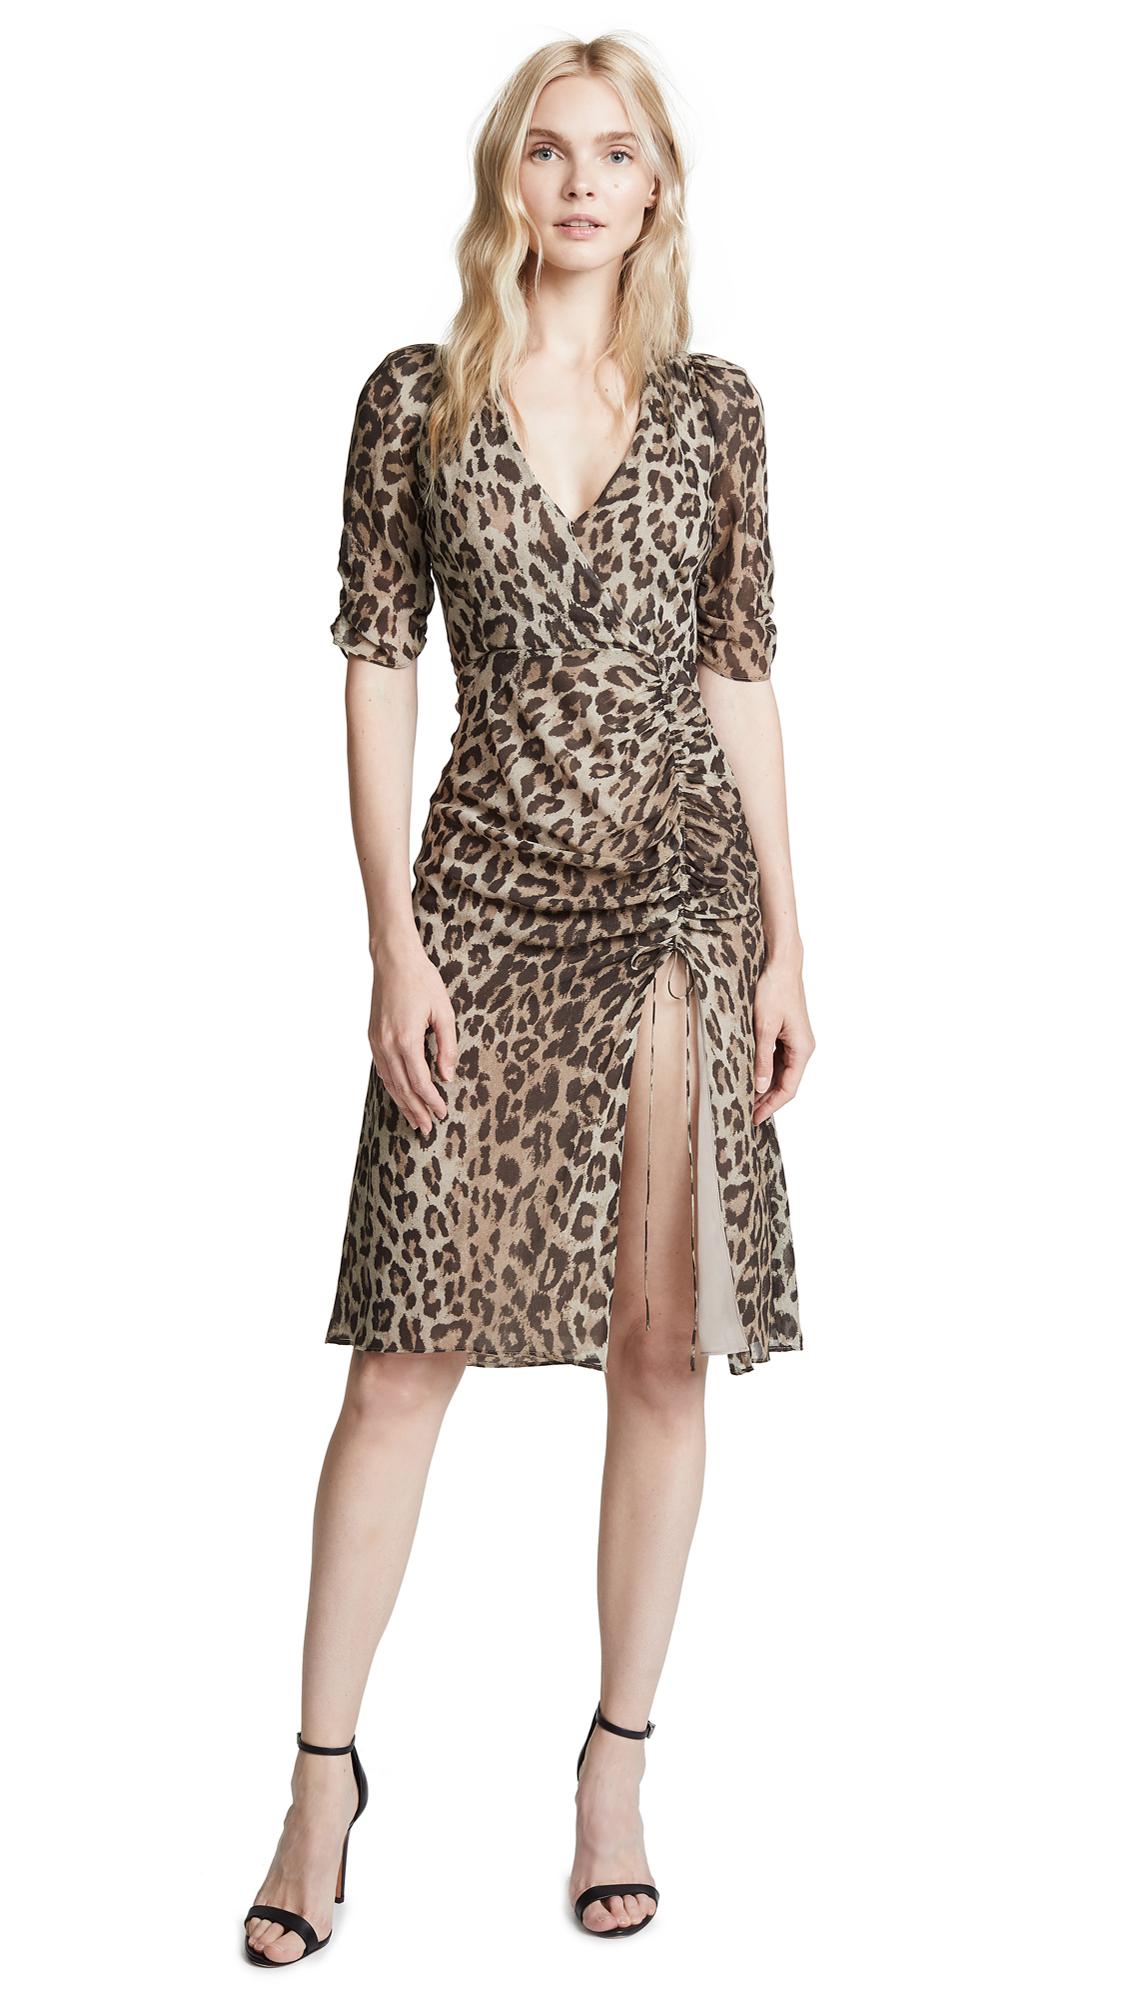 Nicholas Leopard Dress - Leopard